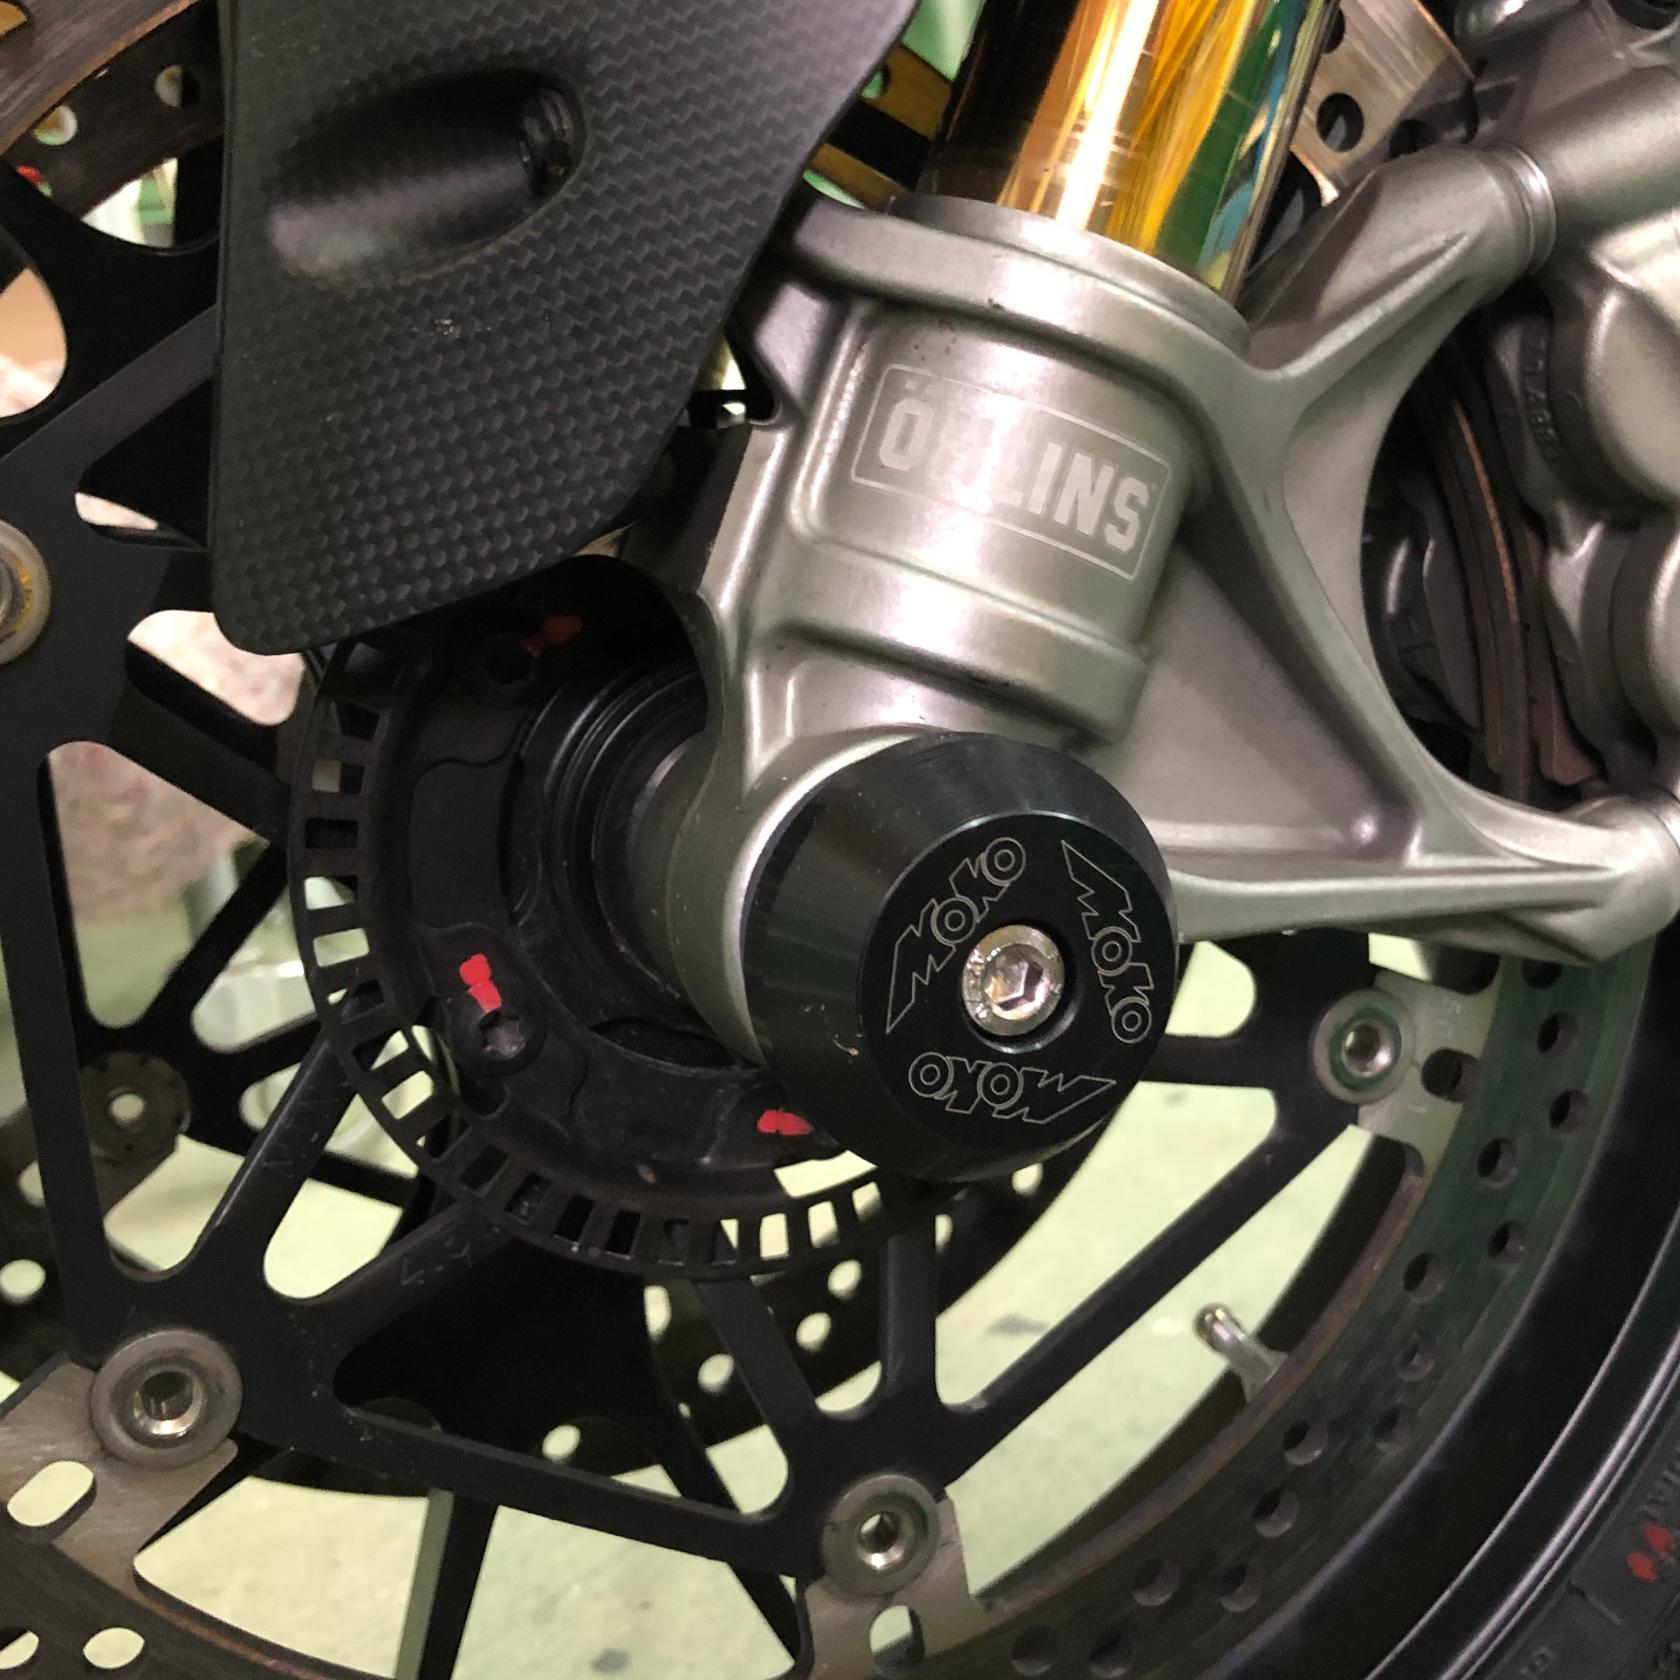 Ducati-Panigale-V2-V4-Gabel-Sturzpads-Moko-side_1680x1680